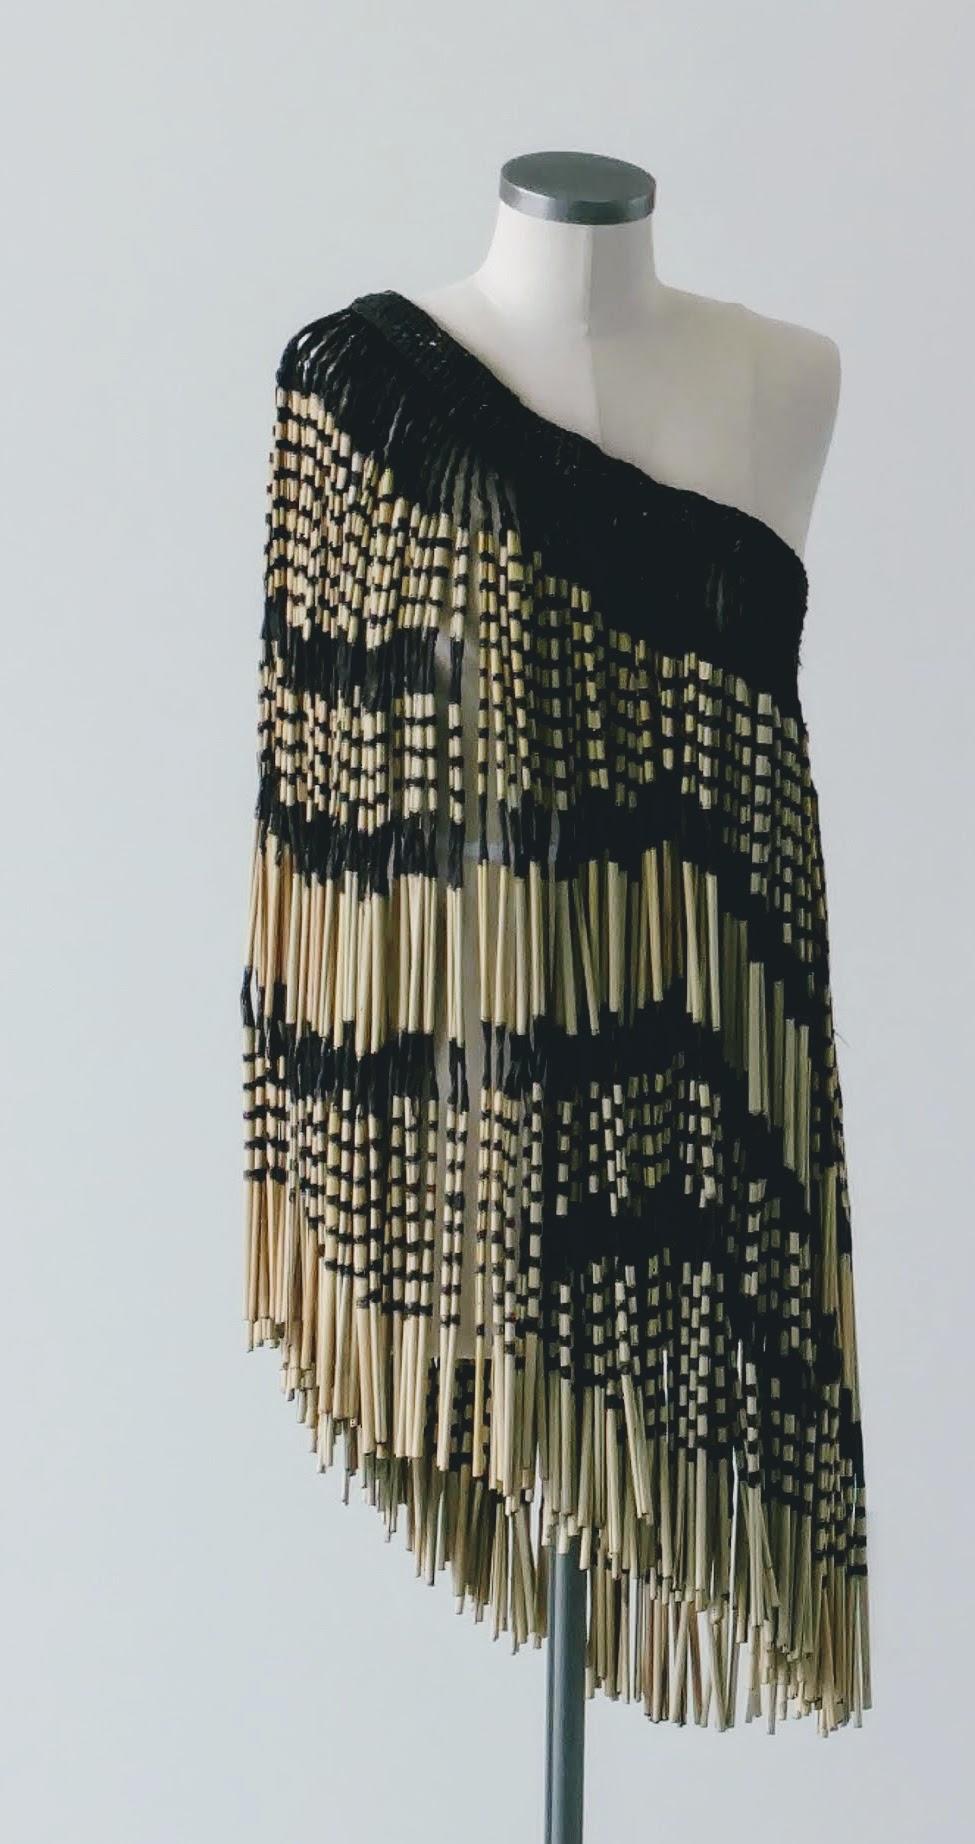 Caption: Maori Weaving by Karl Leonard